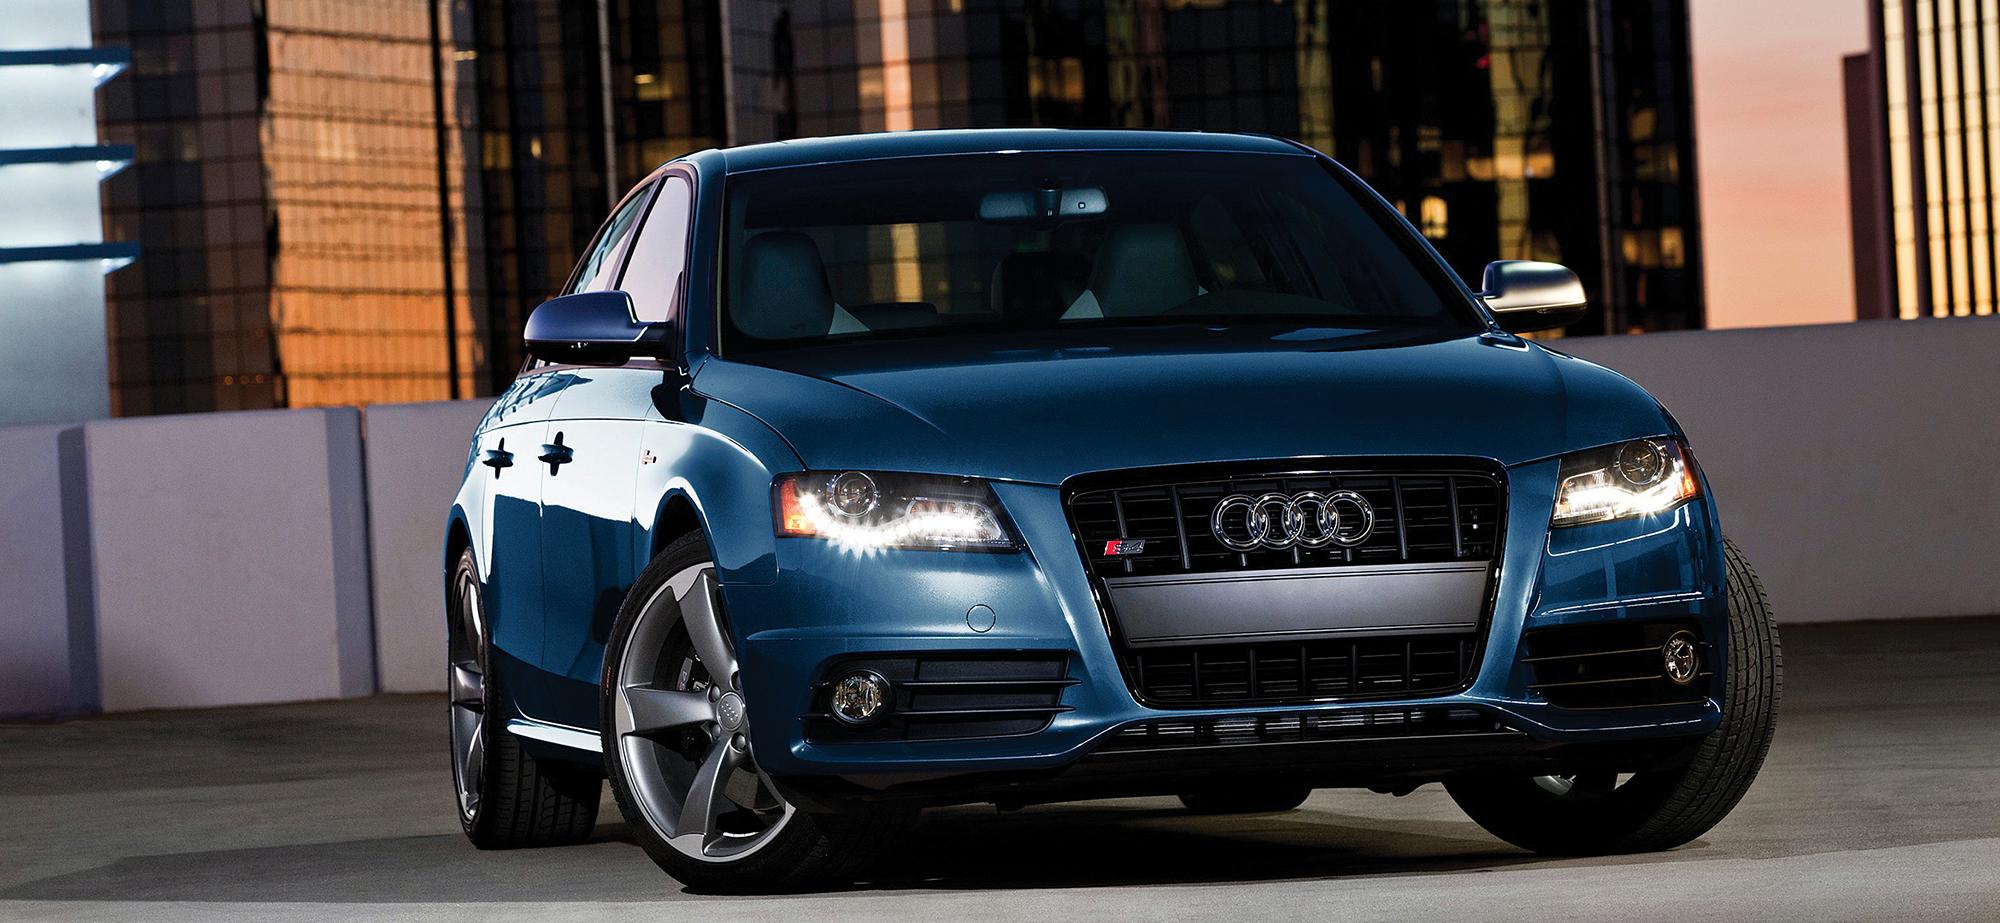 Kelebihan Audi S4 2009 Review